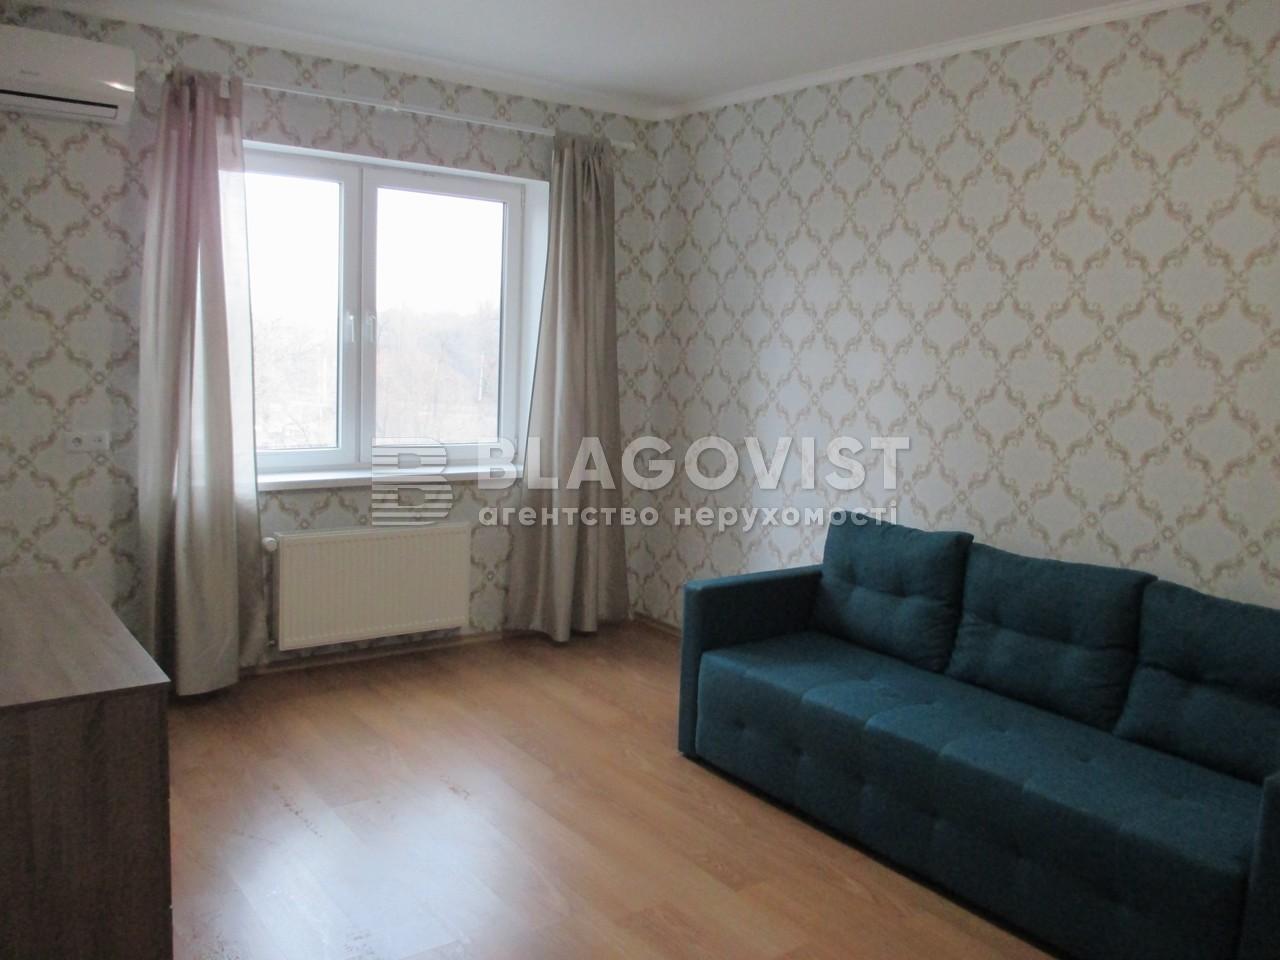 Квартира R-36704, Нижнеключевая, 14, Киев - Фото 7